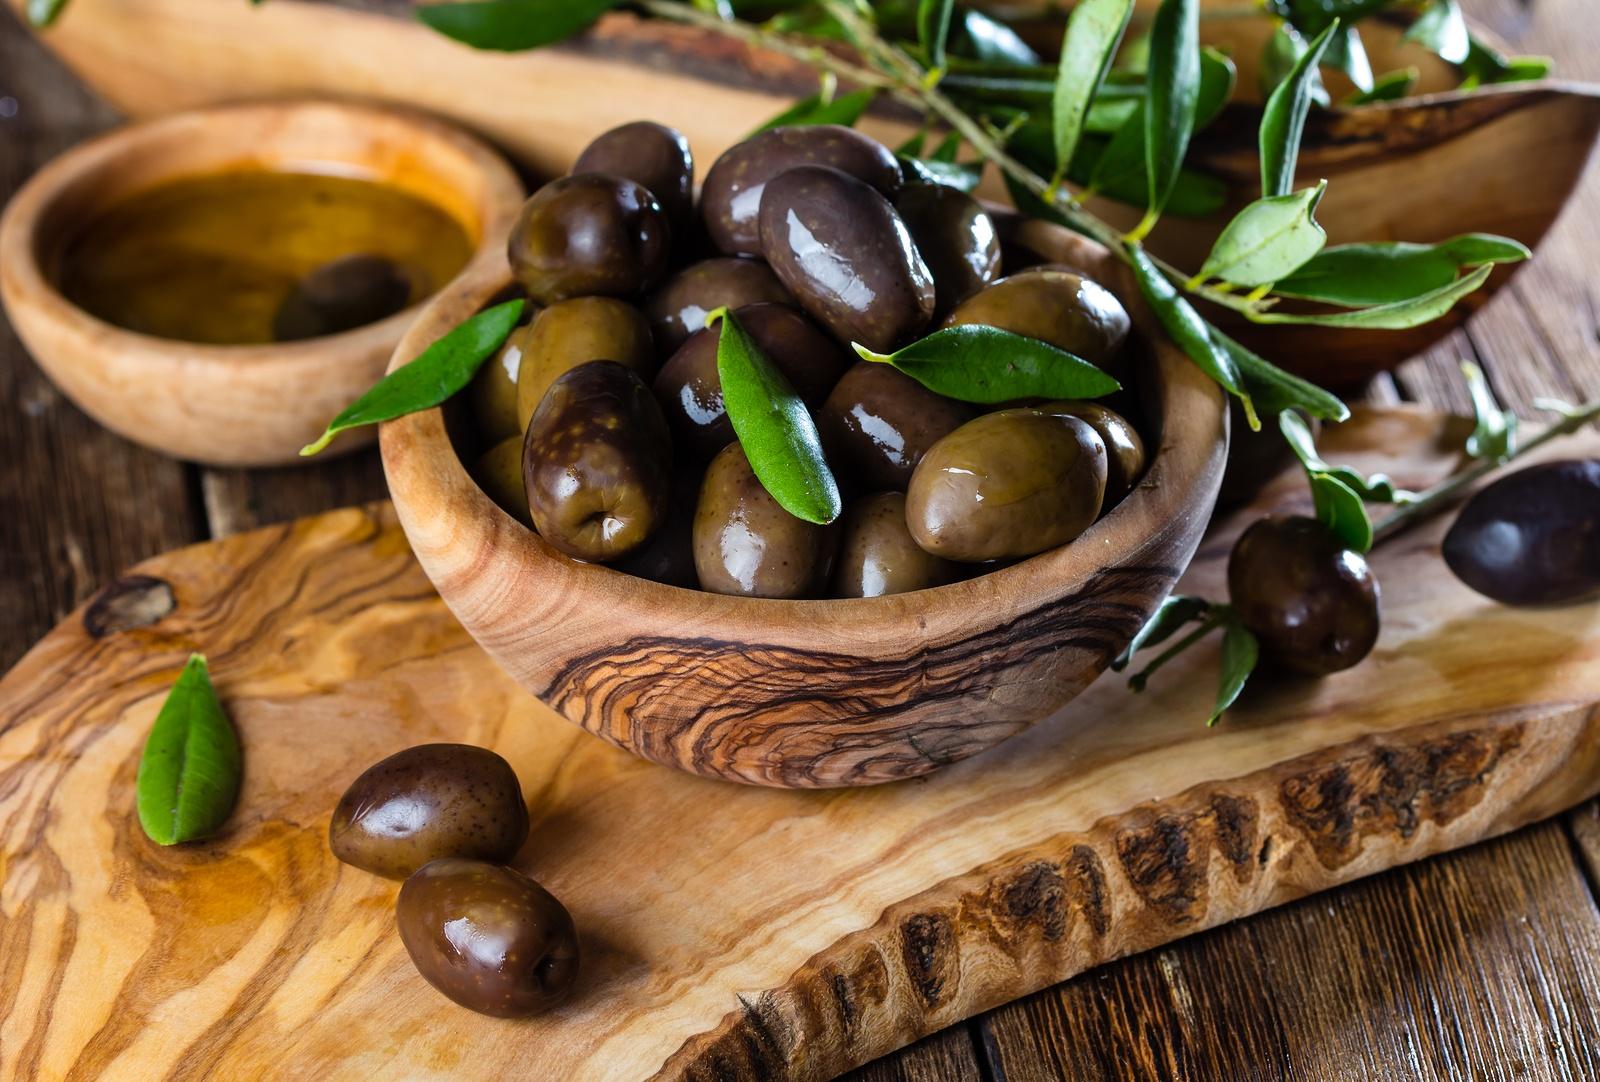 bigstock-Olives-And-Olive-Oil-In-Olive--194238688.jpg